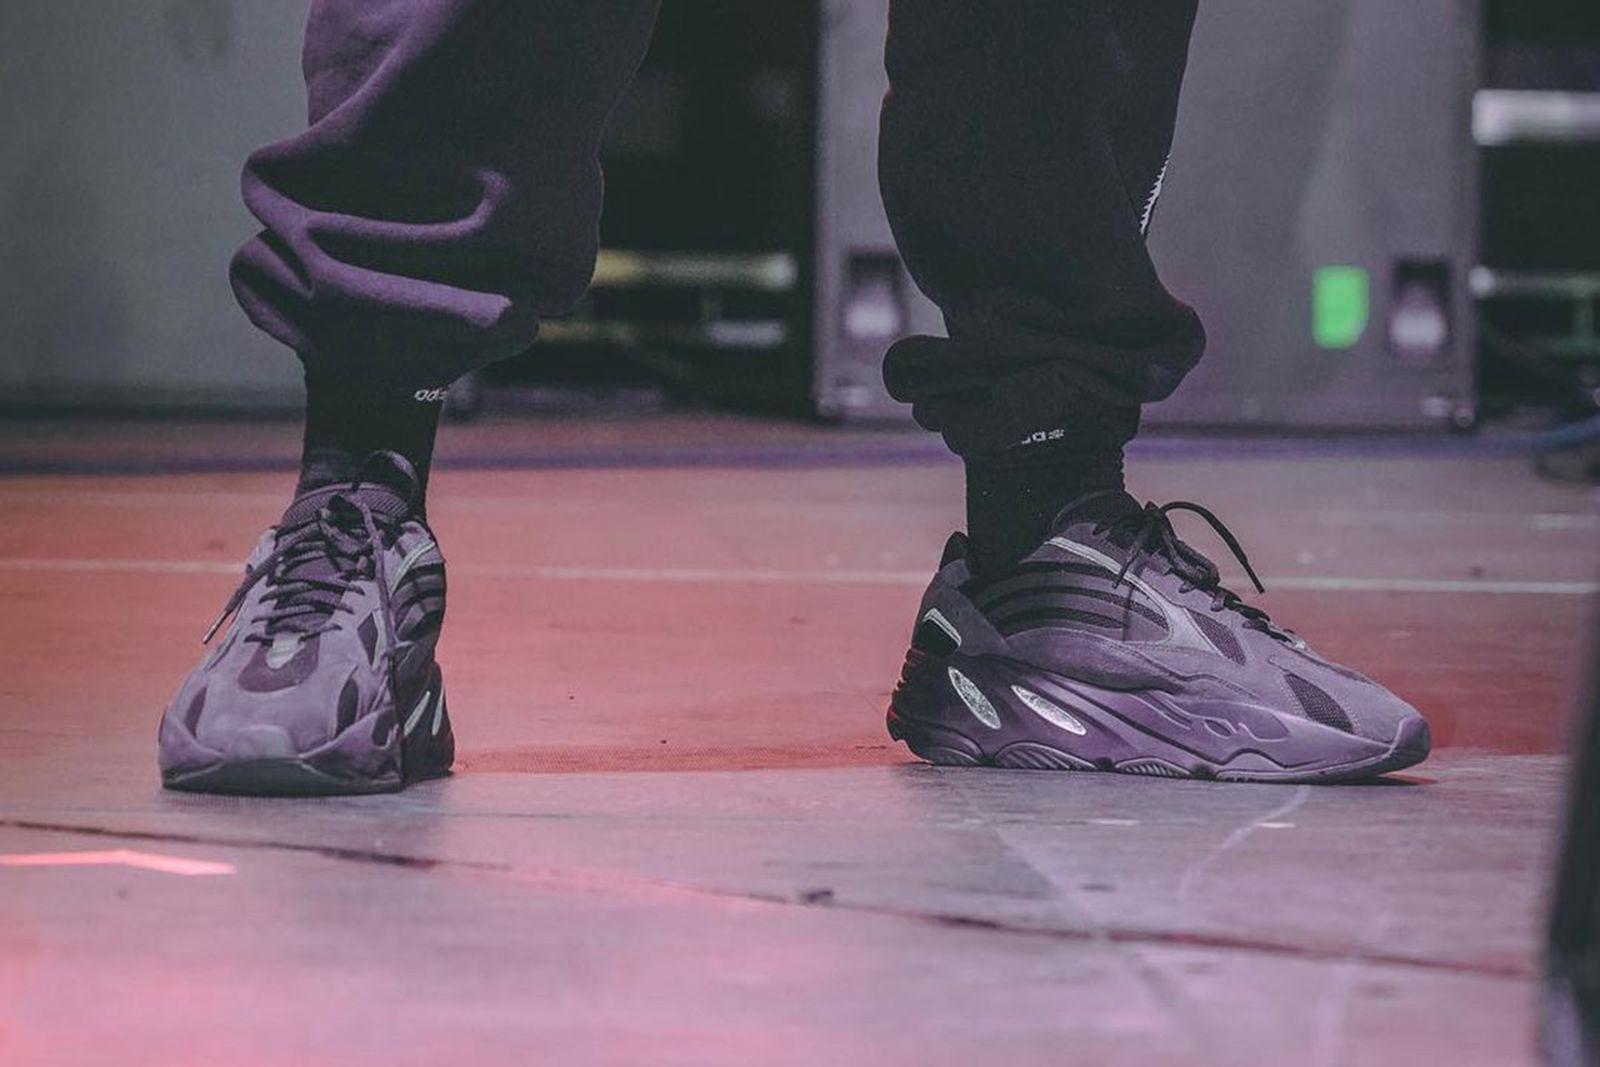 empujar Viaje camino  adidas YEEZY Boost 700 V2 Triple Black: Release Information